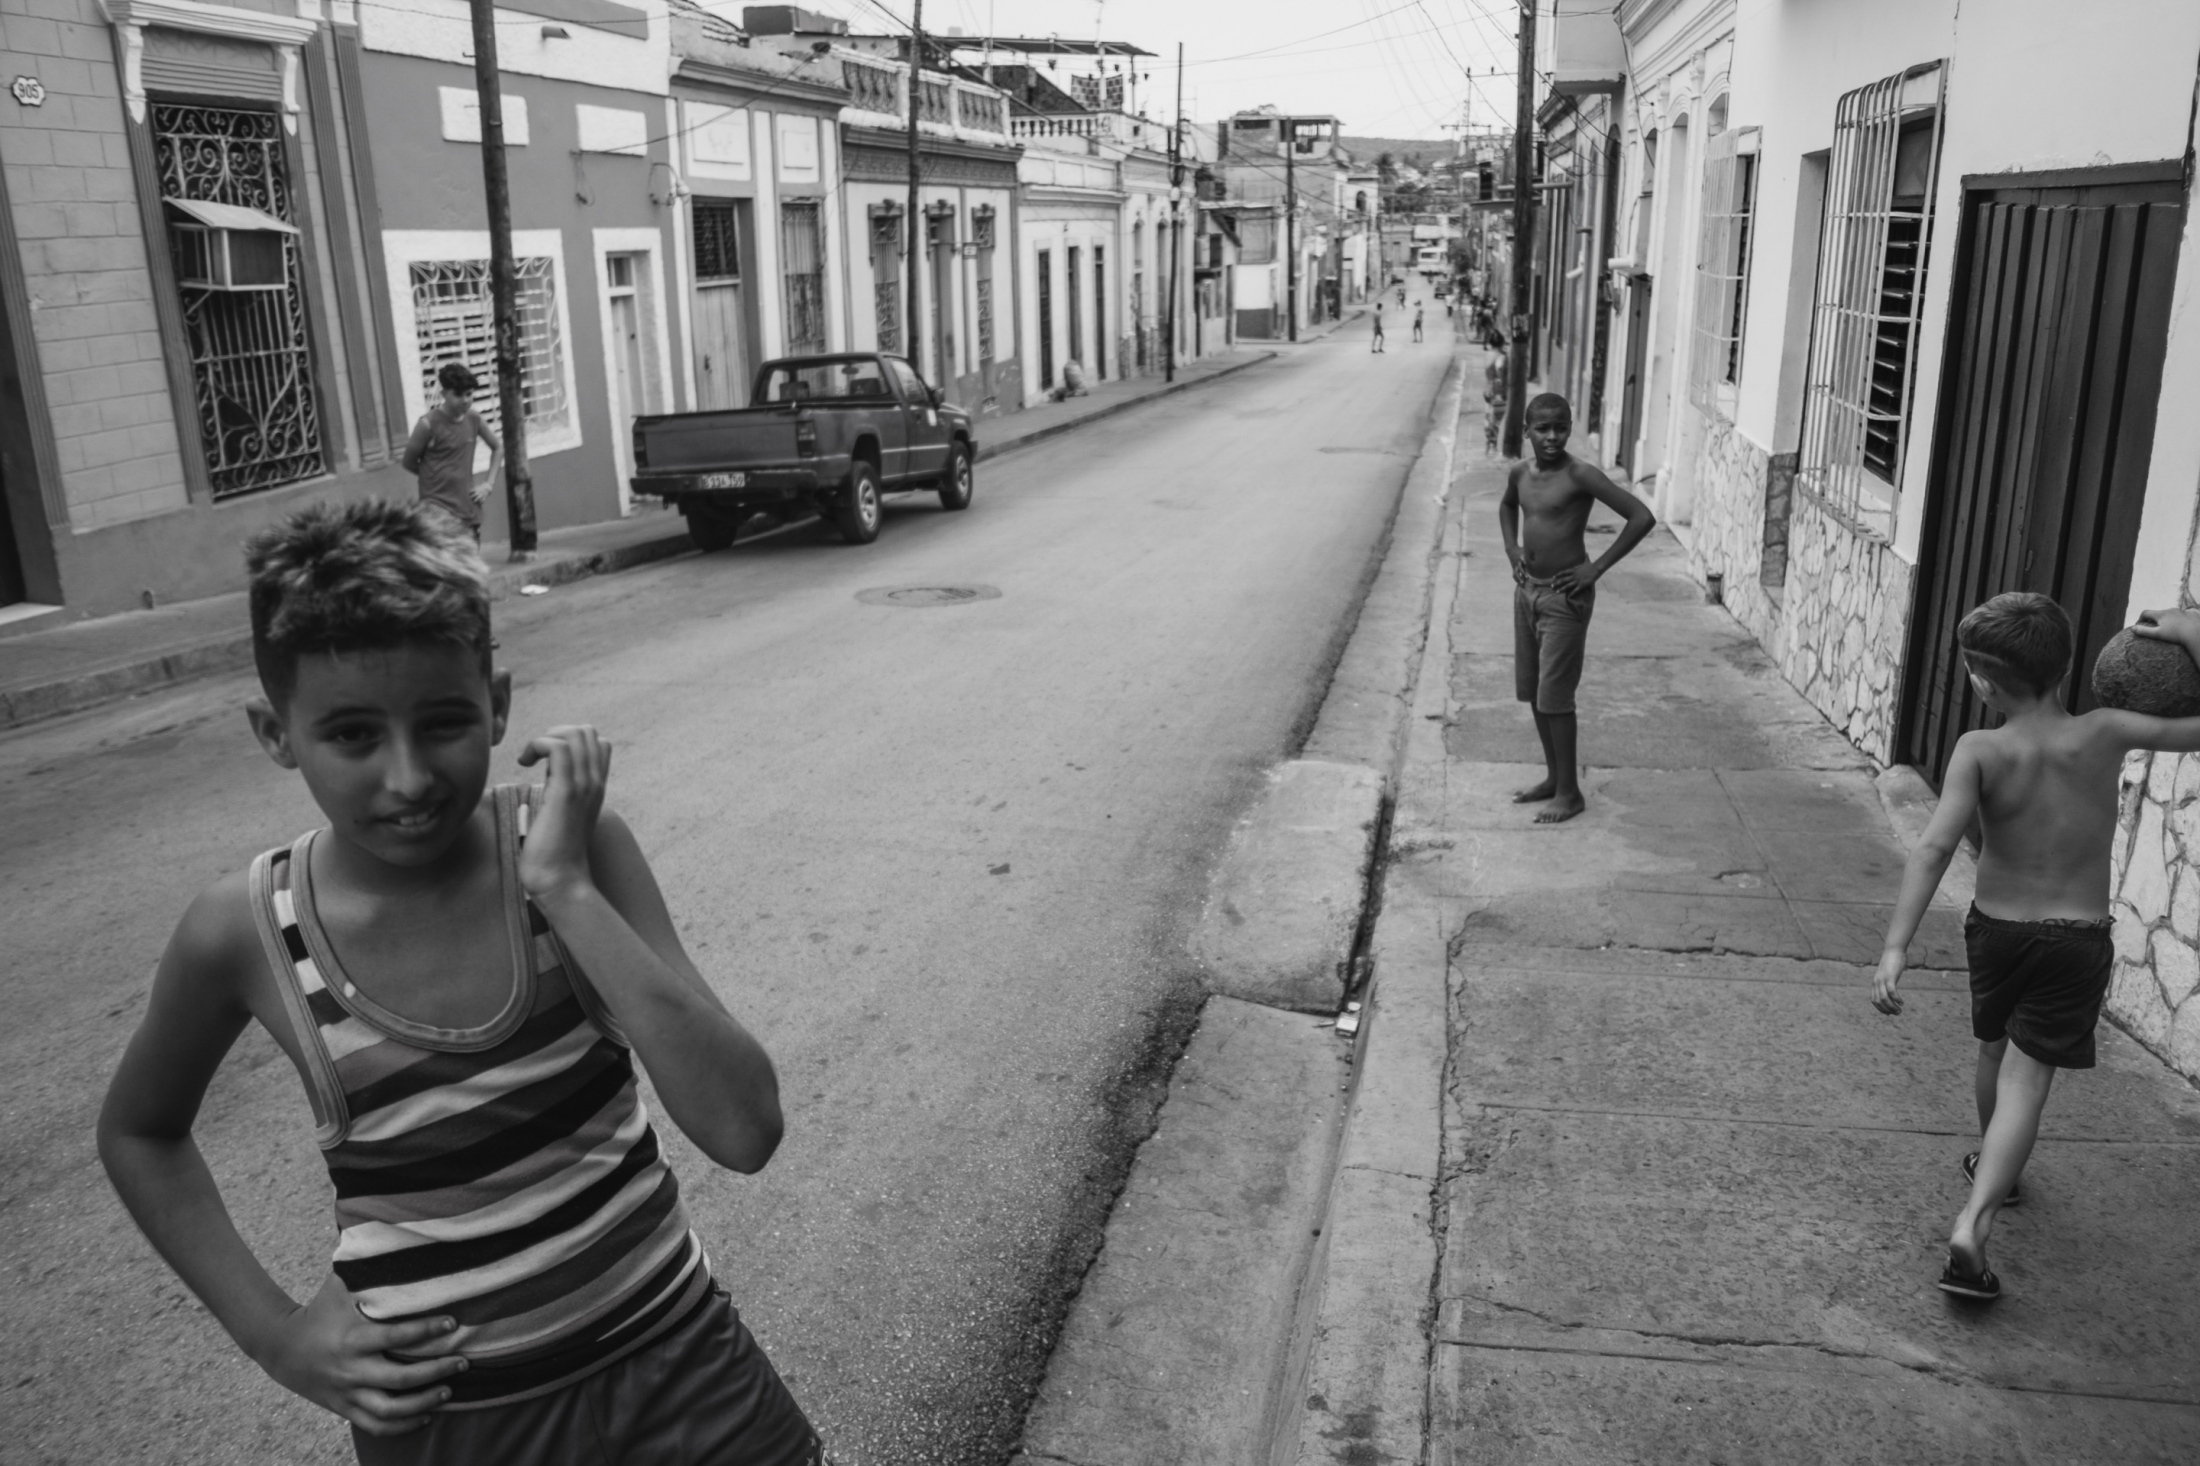 Santiago de Cuba, 2018